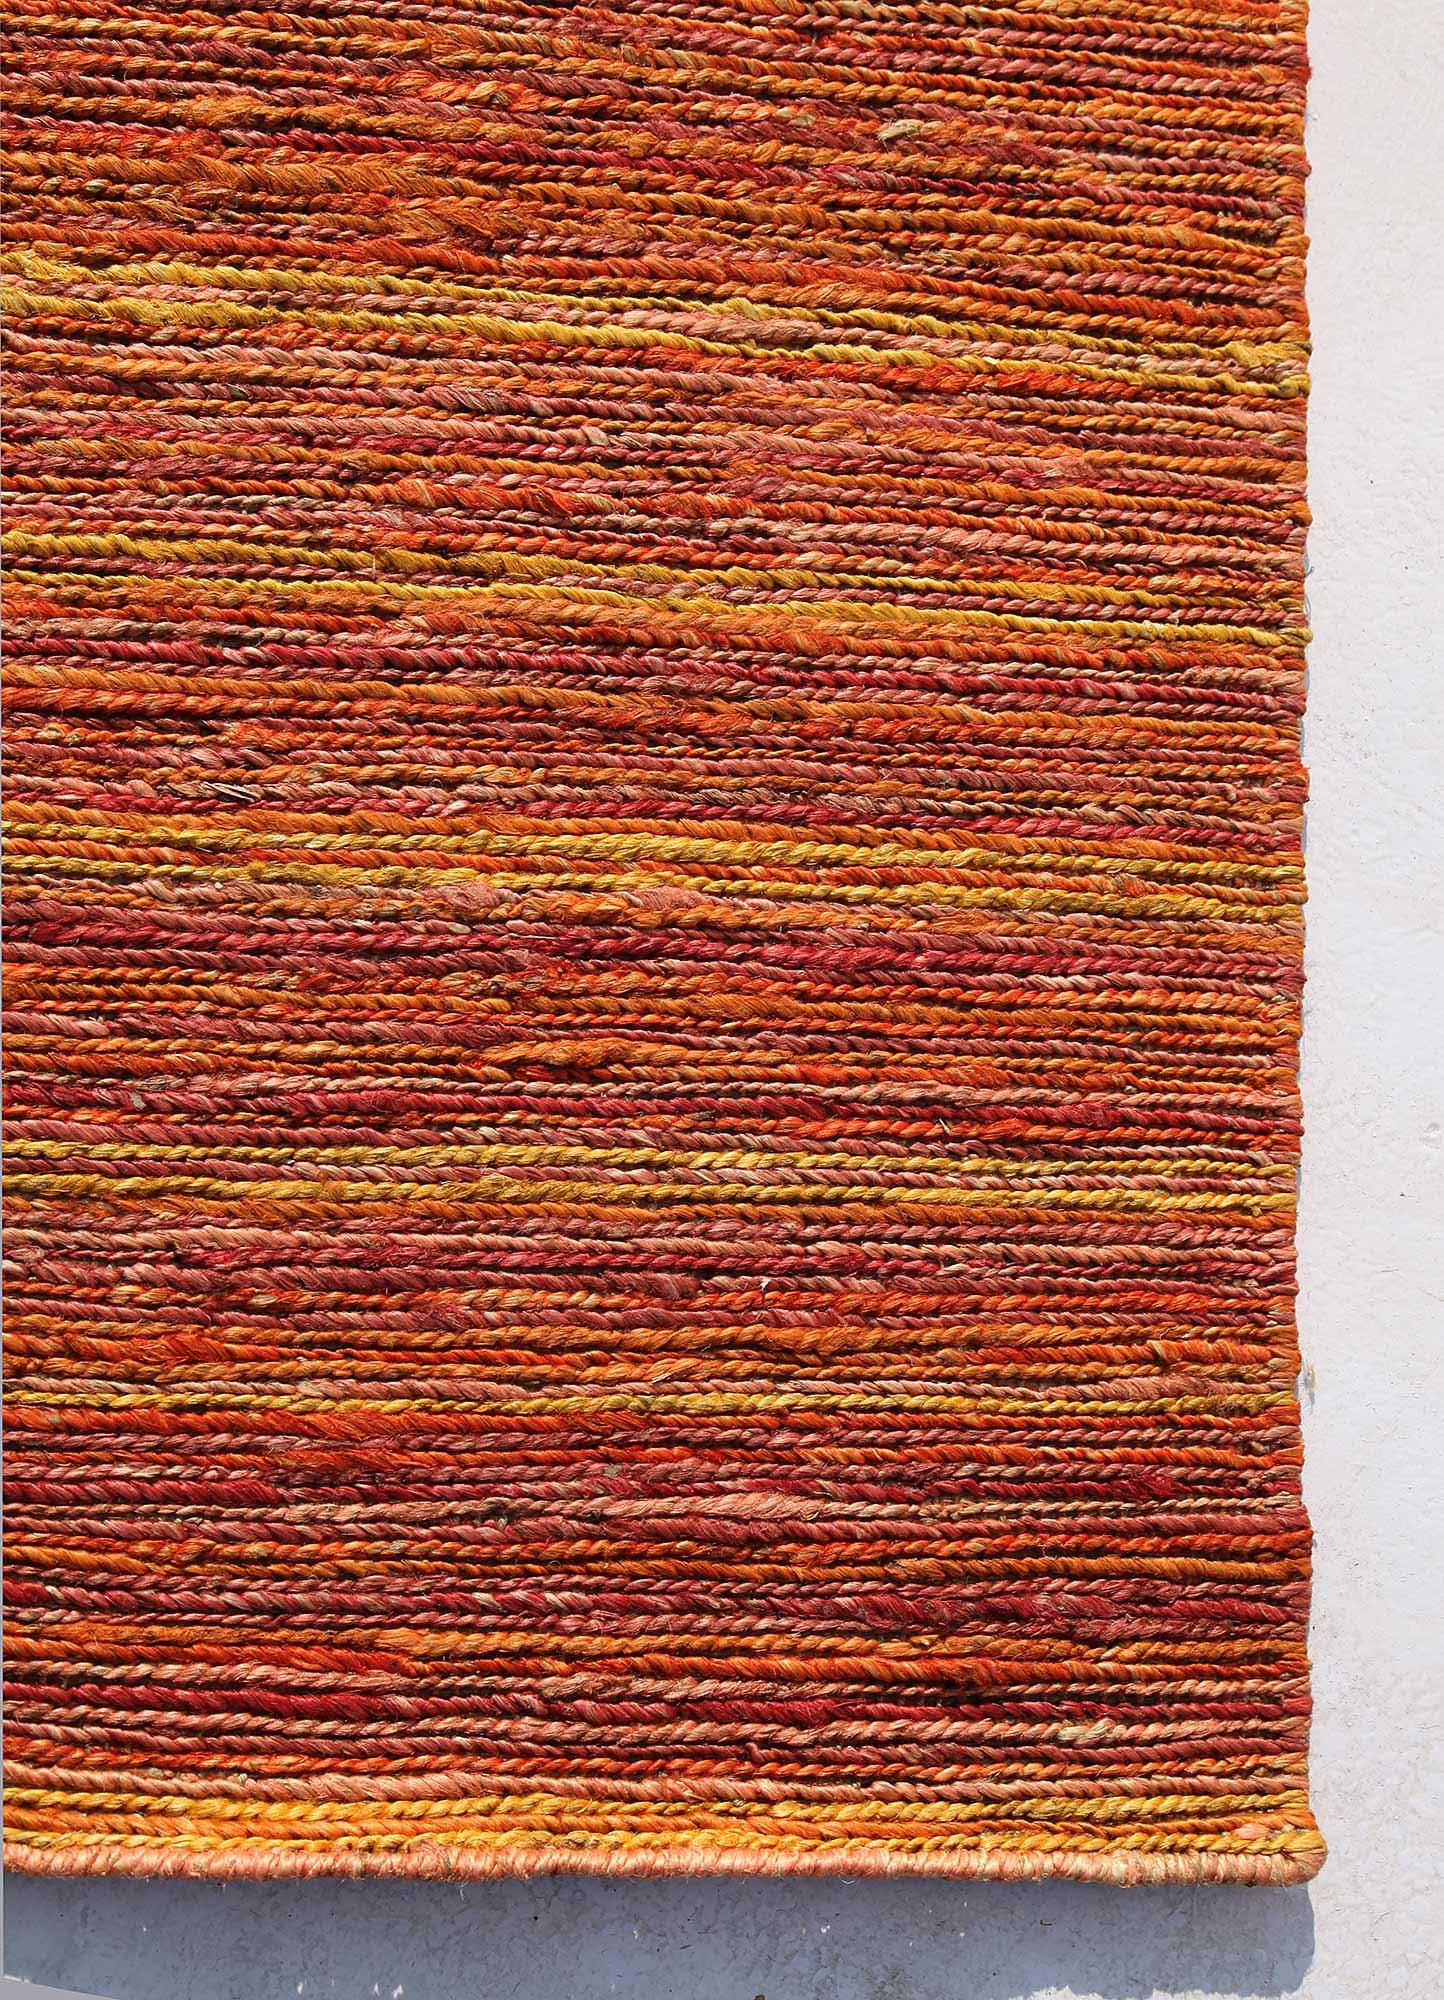 abrash red and orange jute and hemp jute rugs Rug - Corner